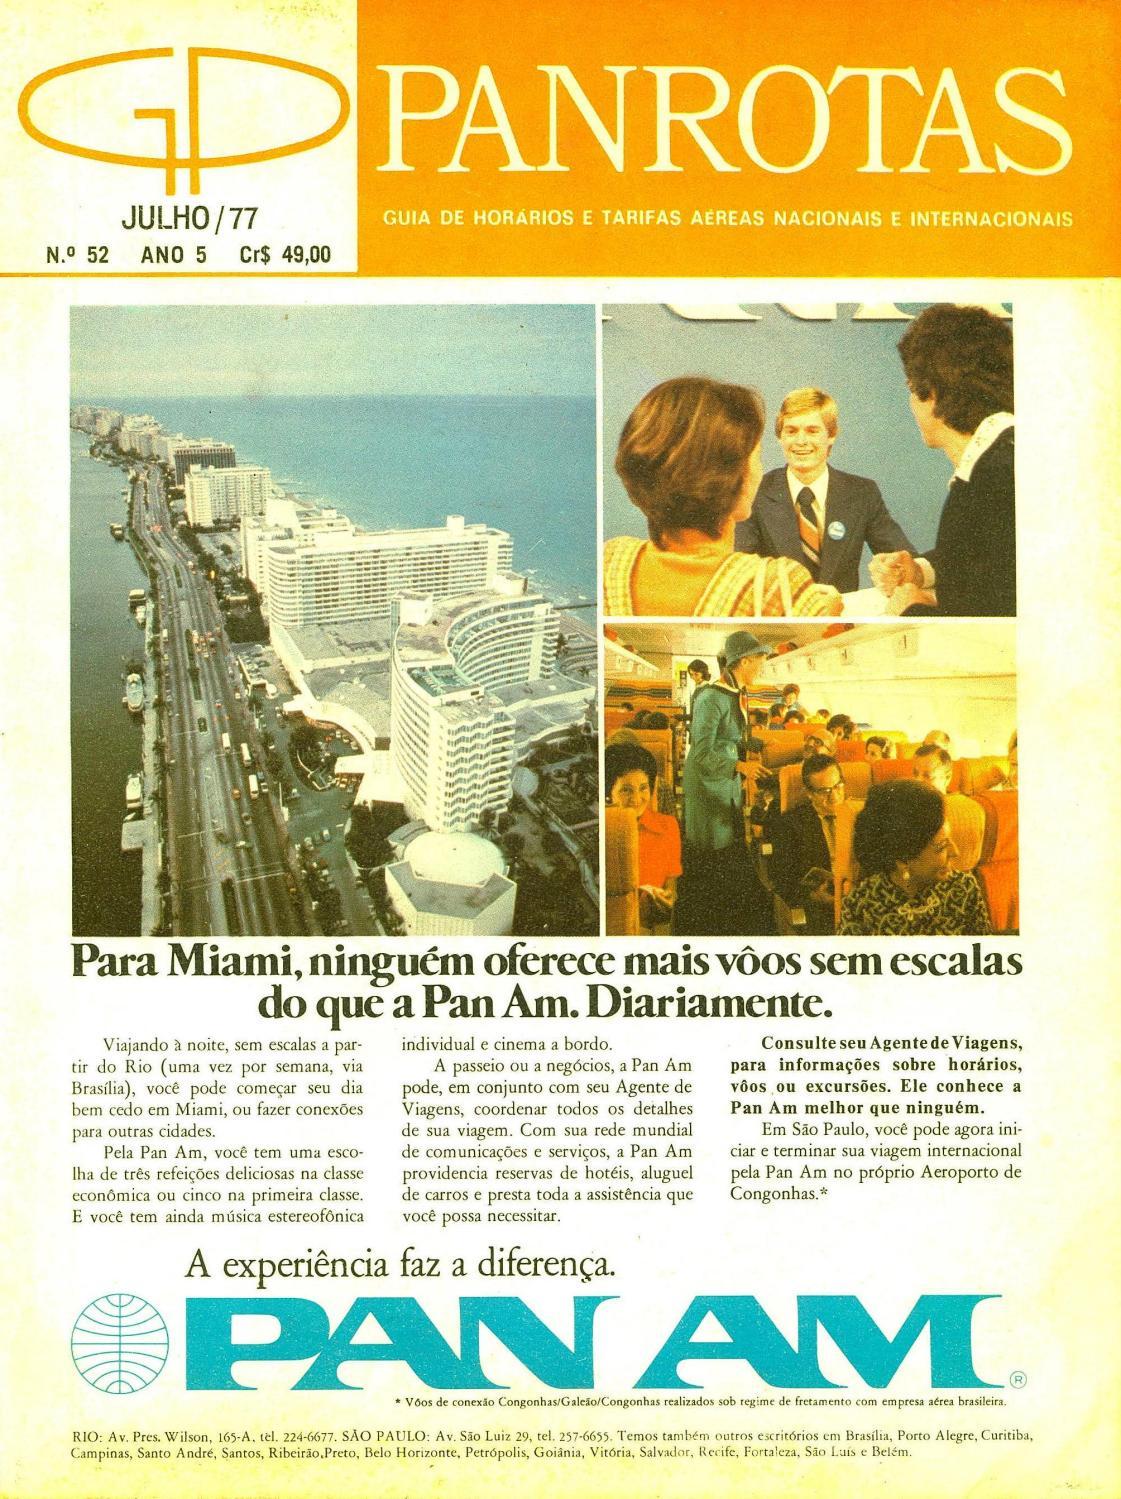 429f8def0 Guia PANROTAS - Edição 52 - Julho 1977 by PANROTAS Editora - issuu